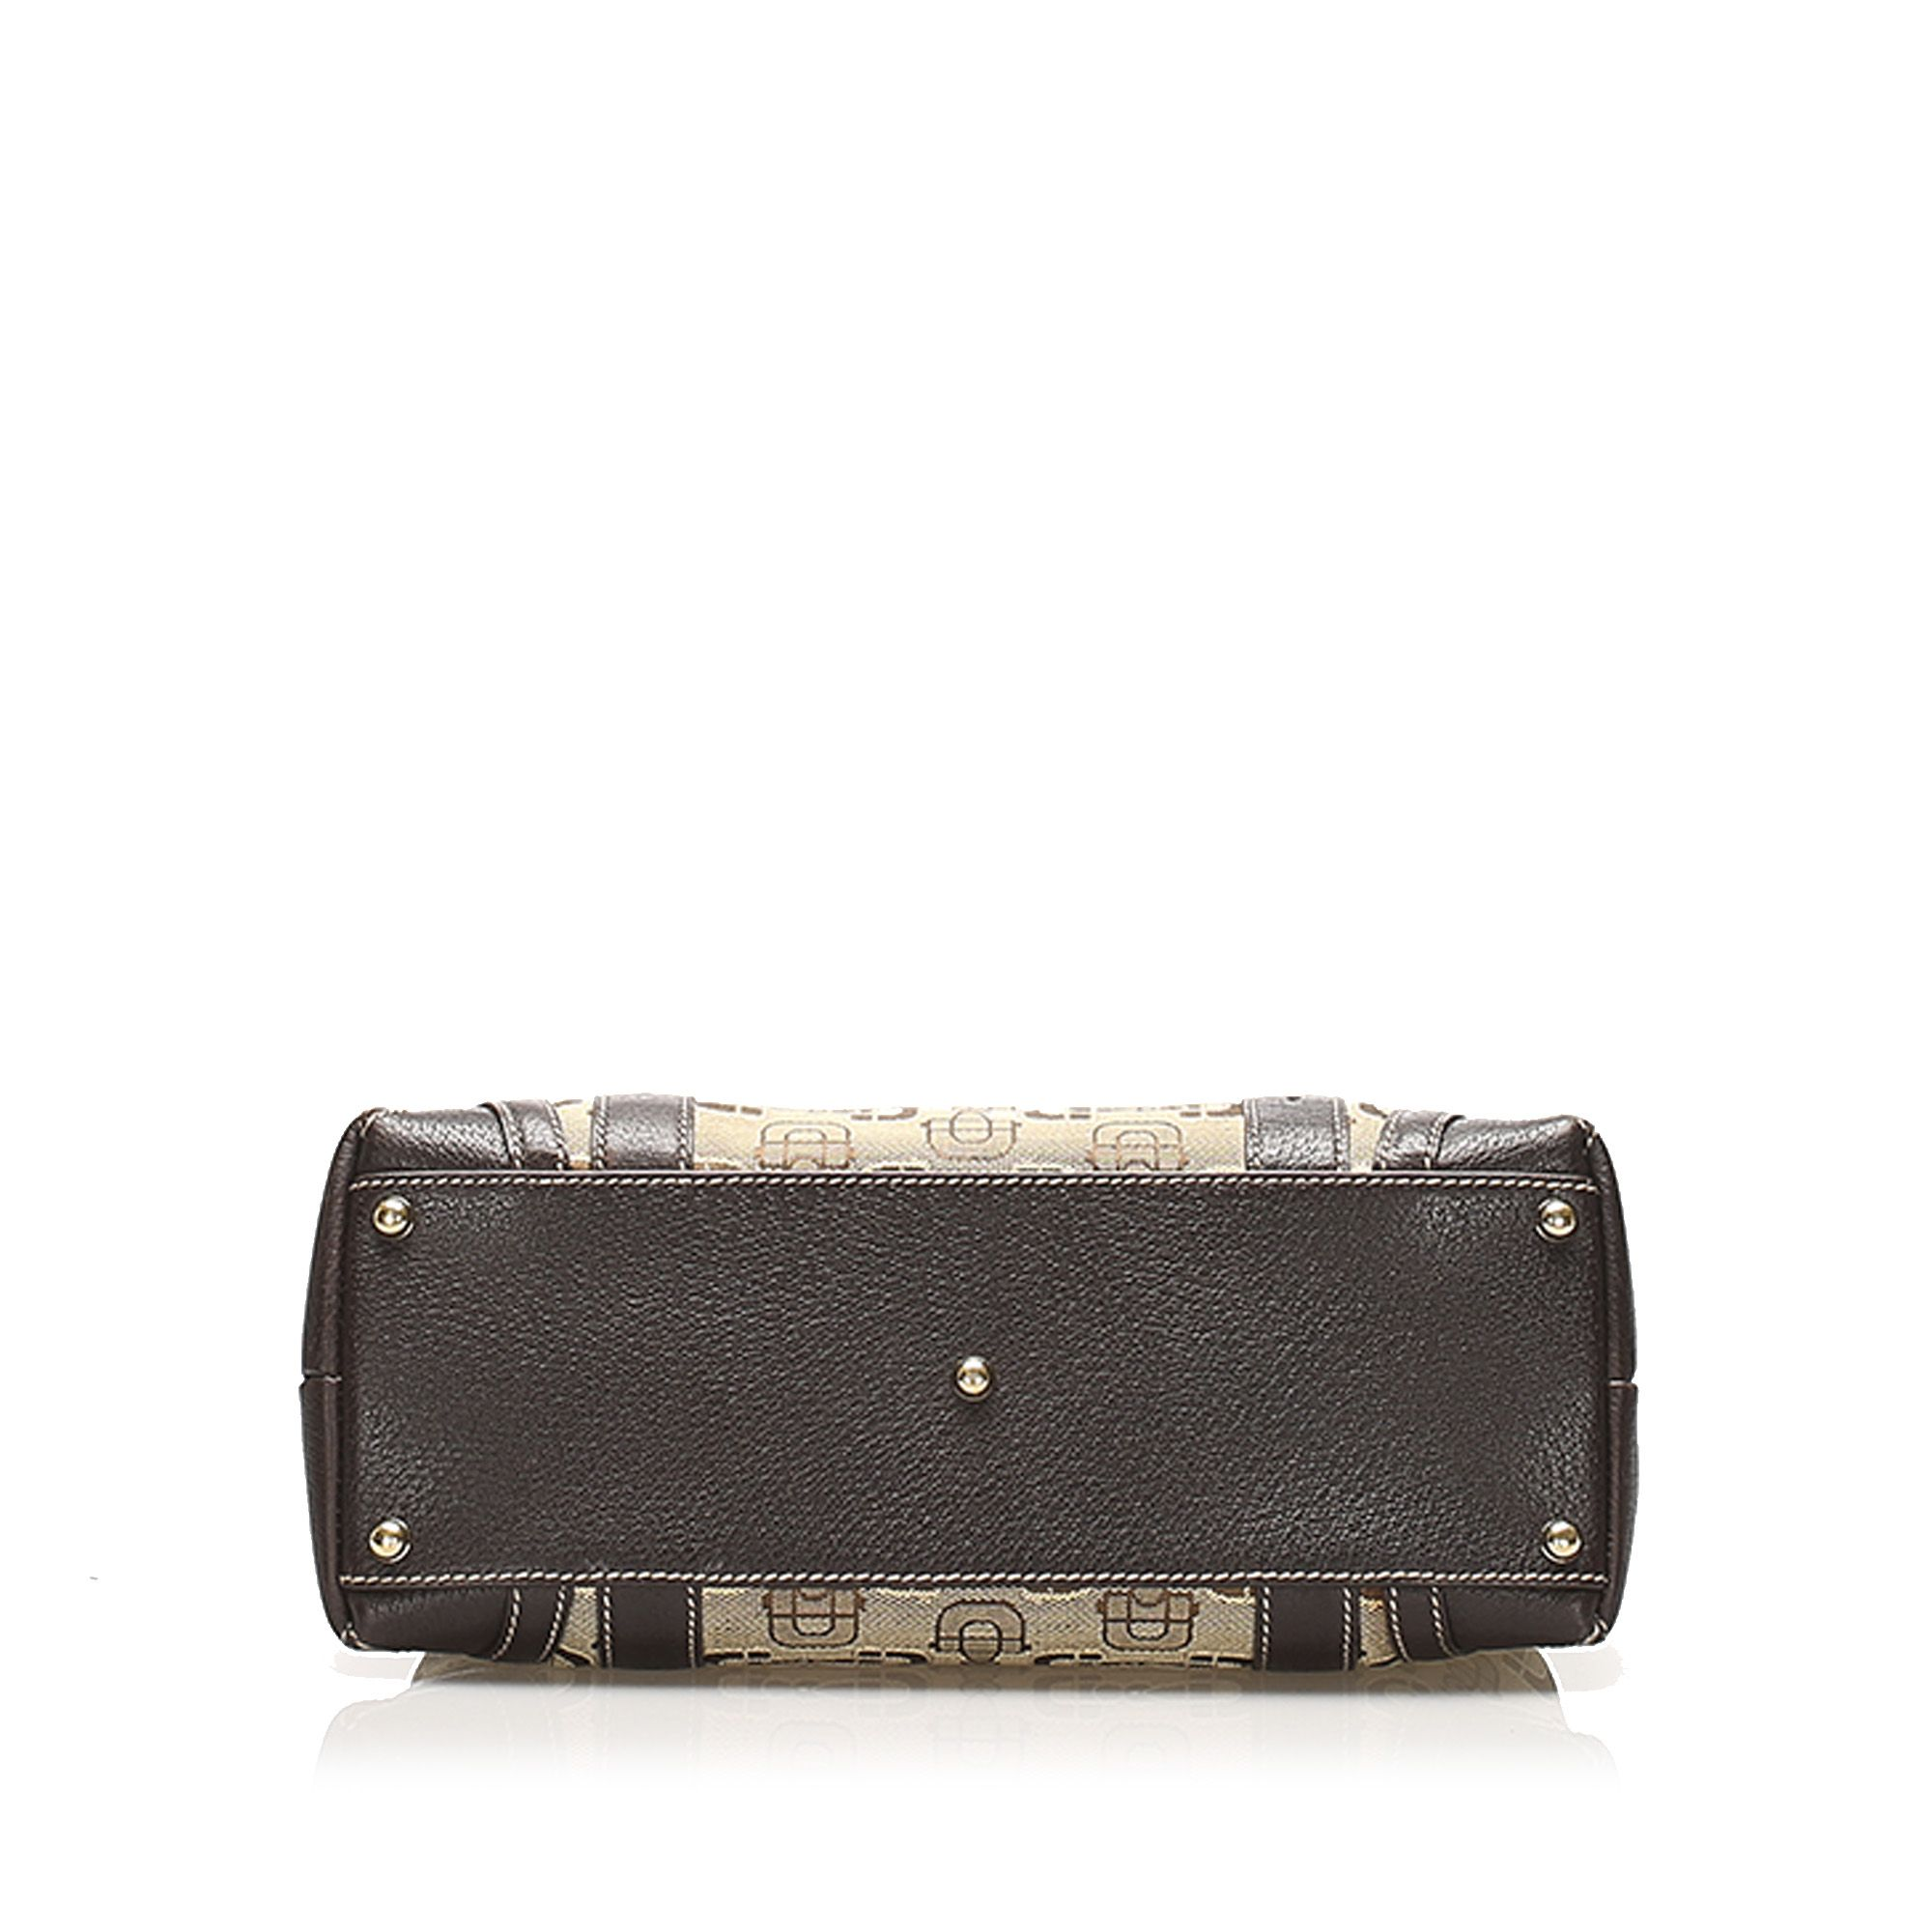 Vintage Gucci Horsebit Canvas Tote Bag Brown